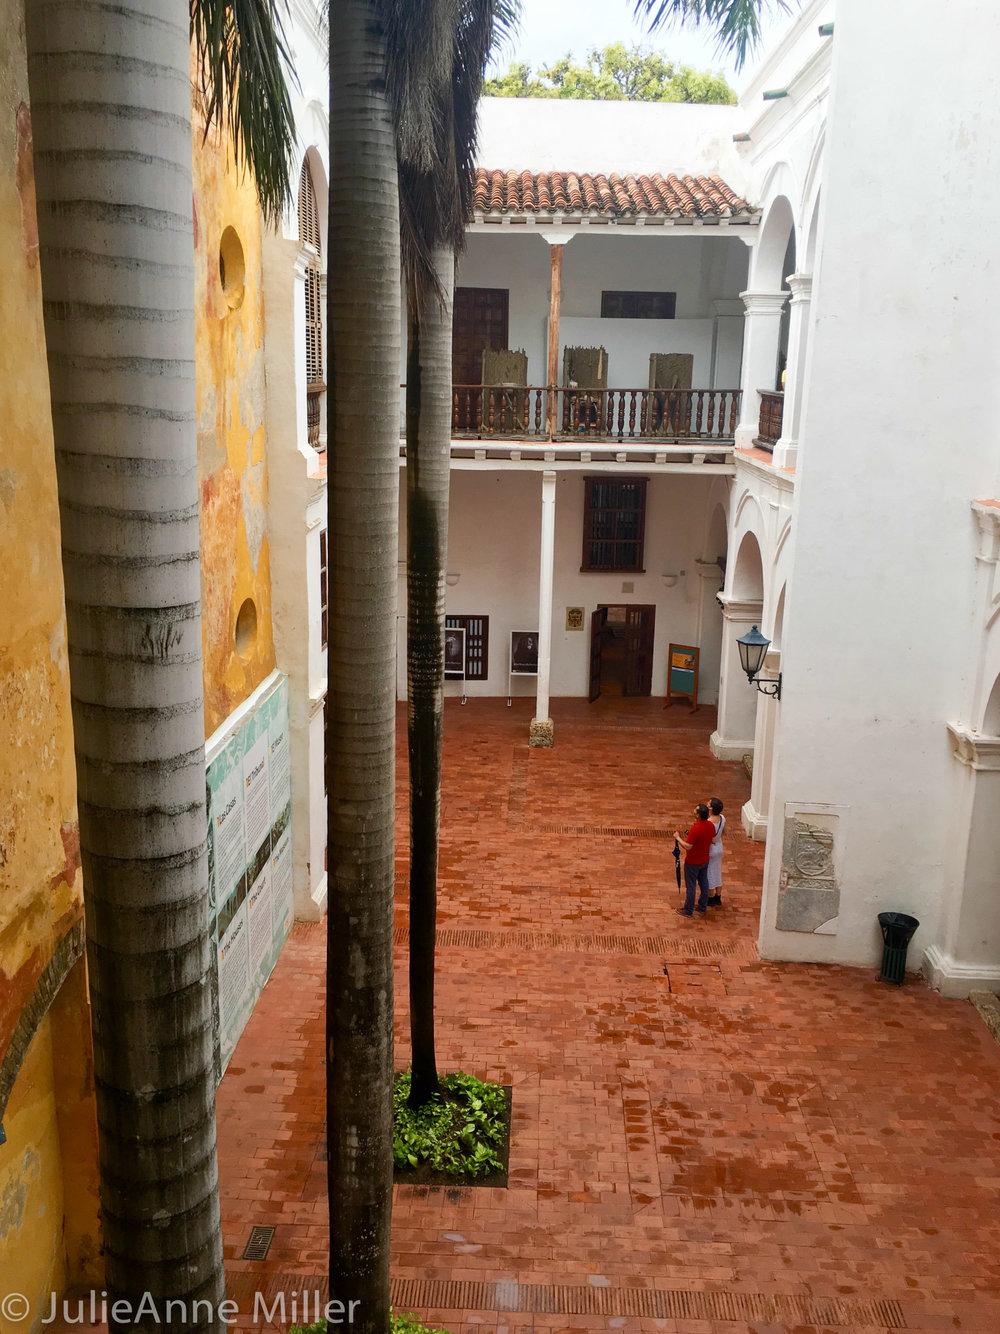 inquisition museum courtyard 2.jpg